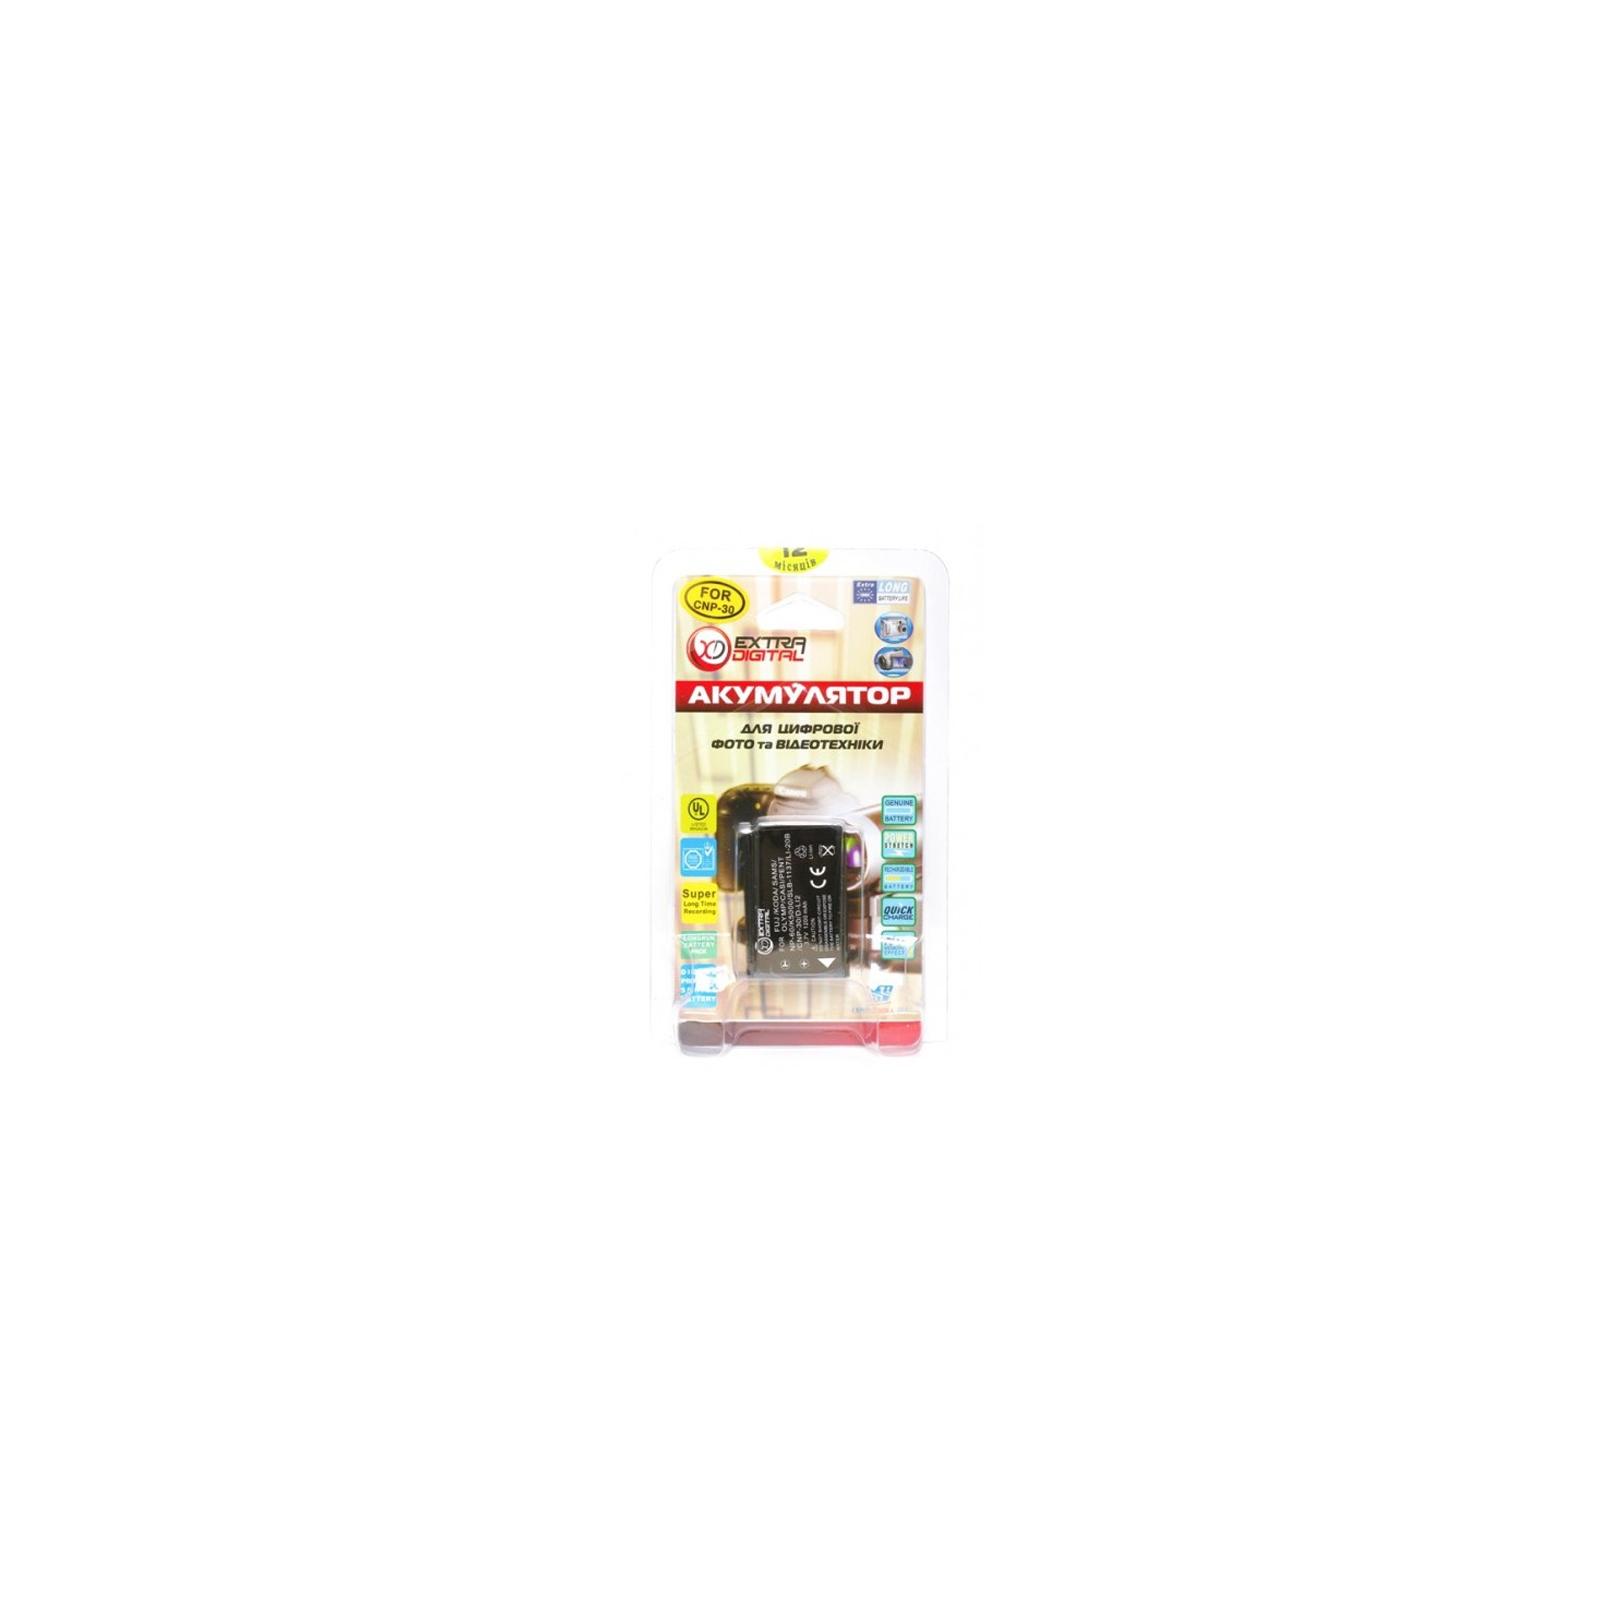 Аккумулятор к фото/видео EXTRADIGITAL Casio NP-30, KLIC-5000, LI-20B, D-L12, NP-60 (DV00DV1043) изображение 3